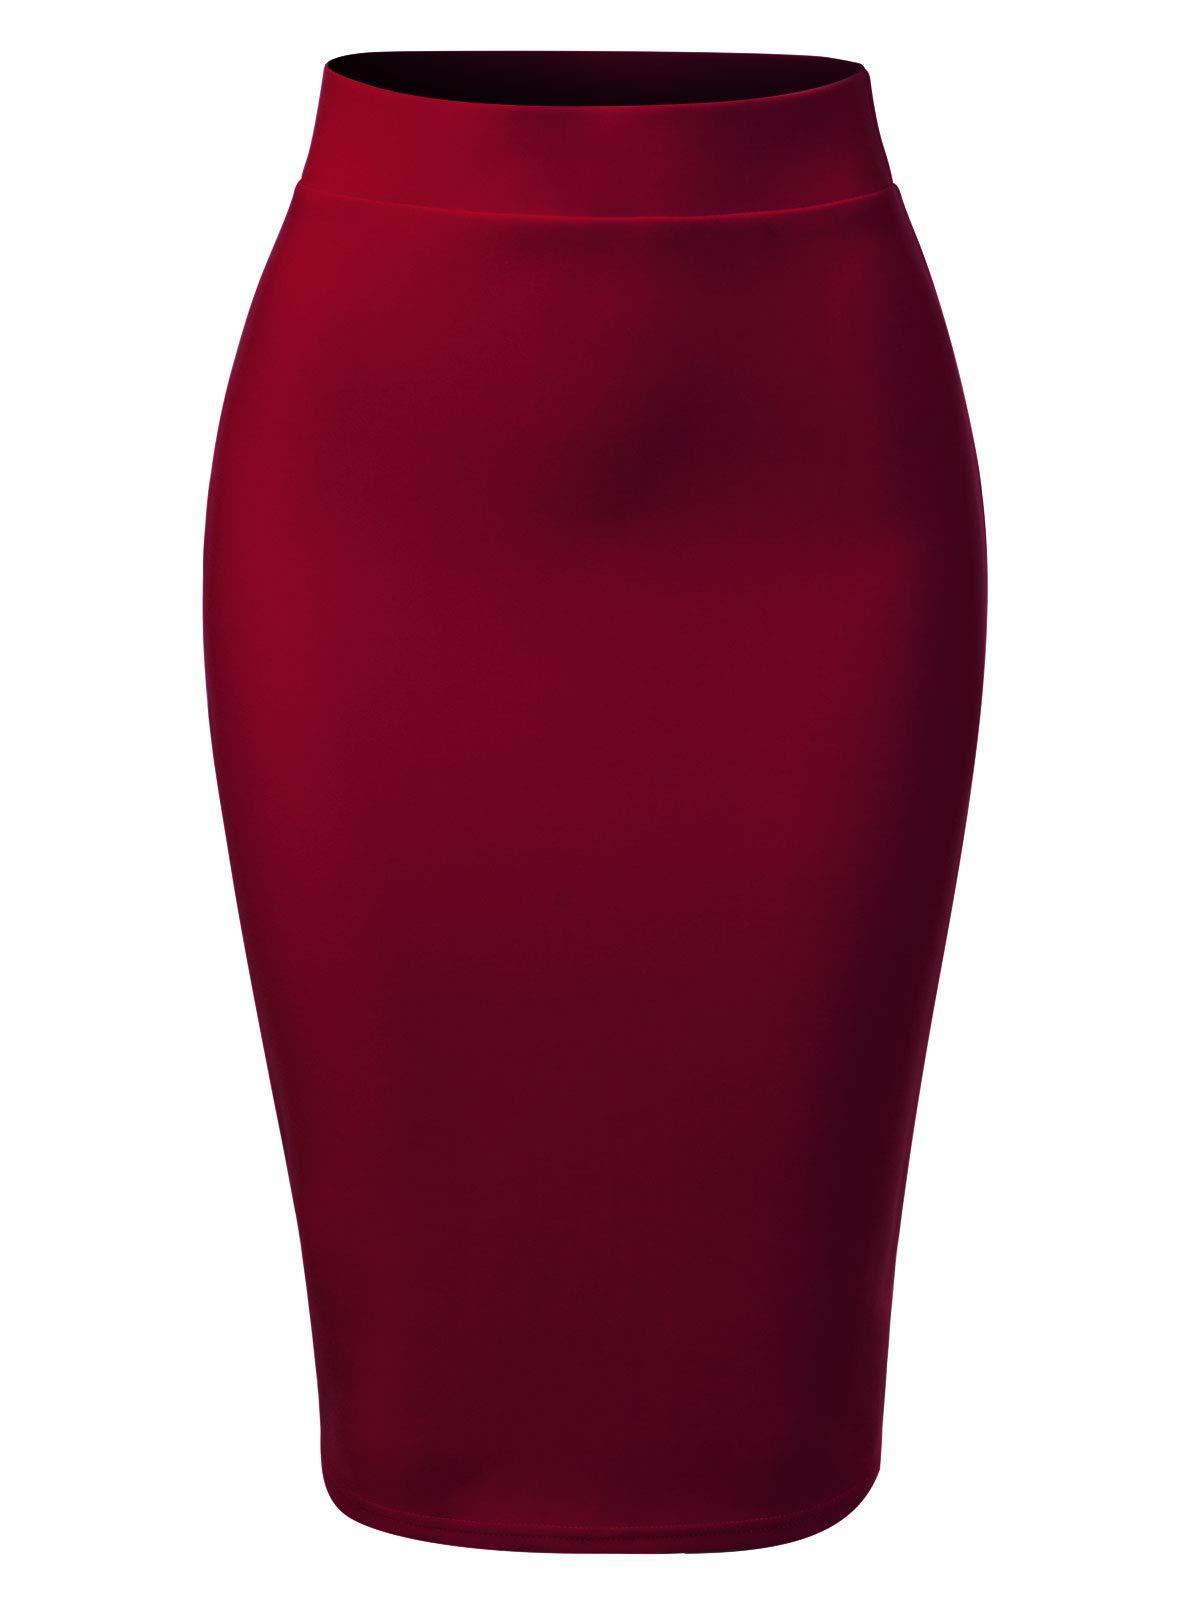 MixMatchy Women's Casual Classic Bodycon Pencil Skirt Burgundy 2XL